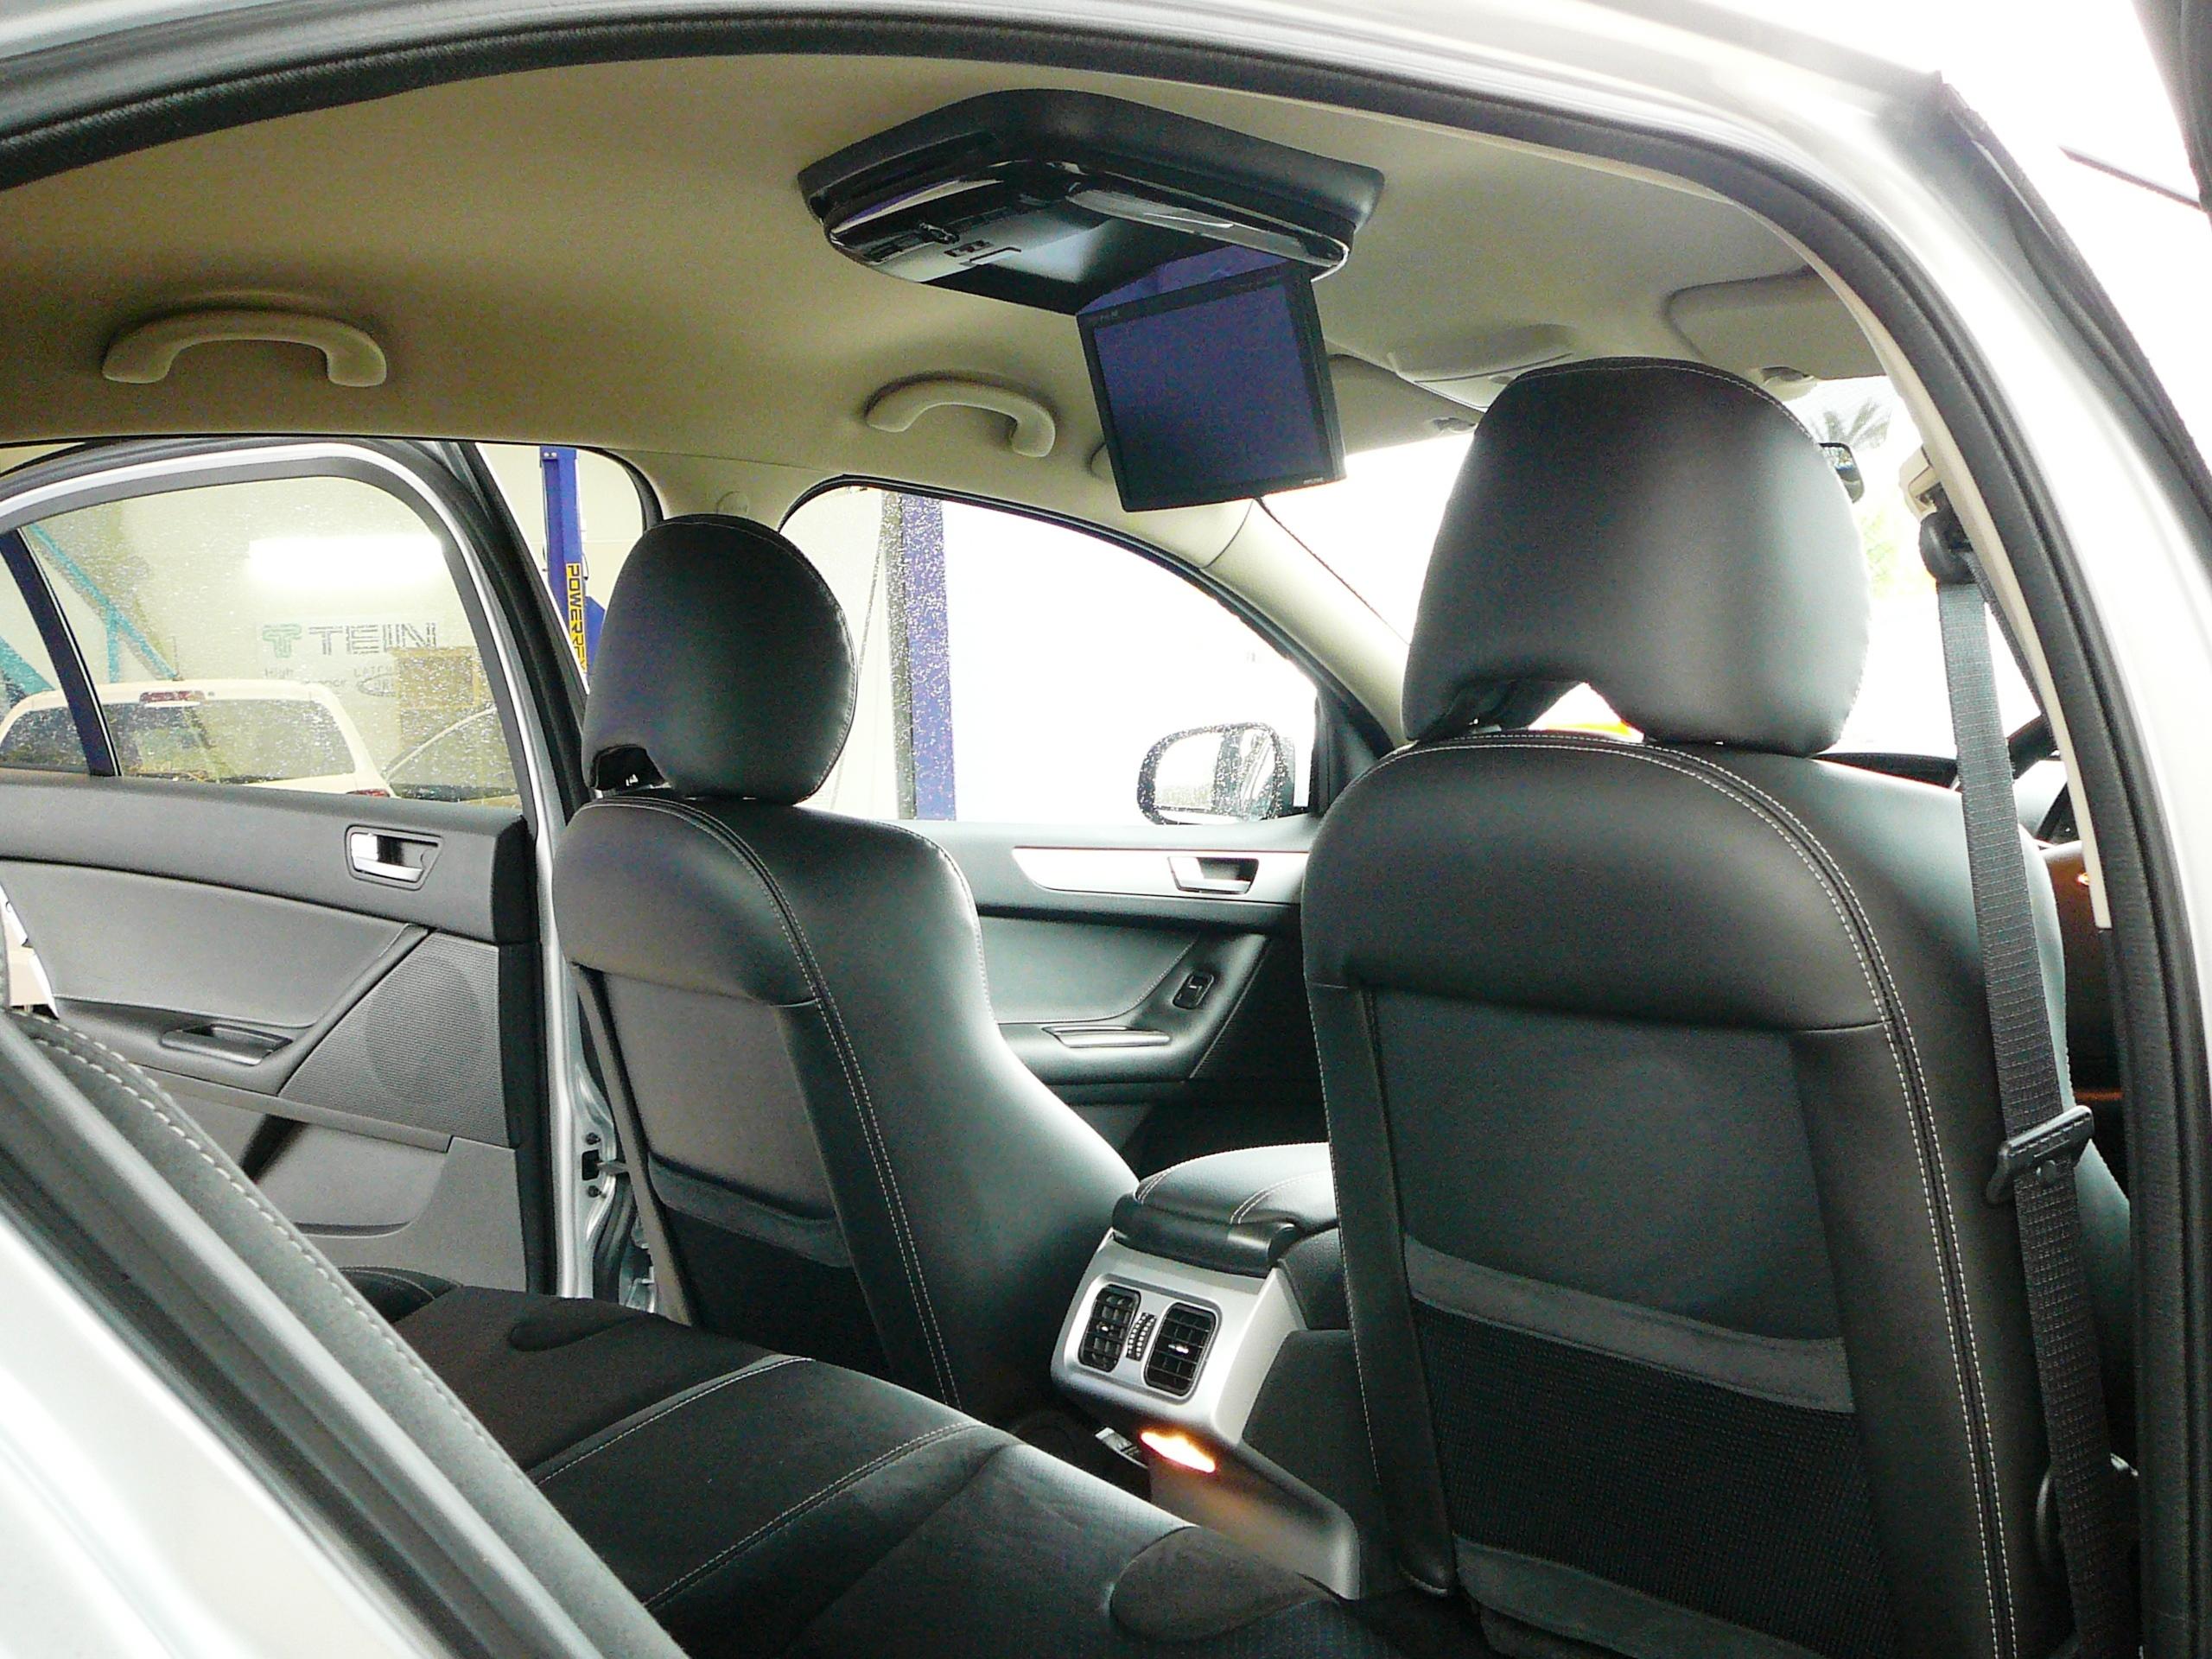 Ford Falcon FPV GT Alpine DVD roof screen installation